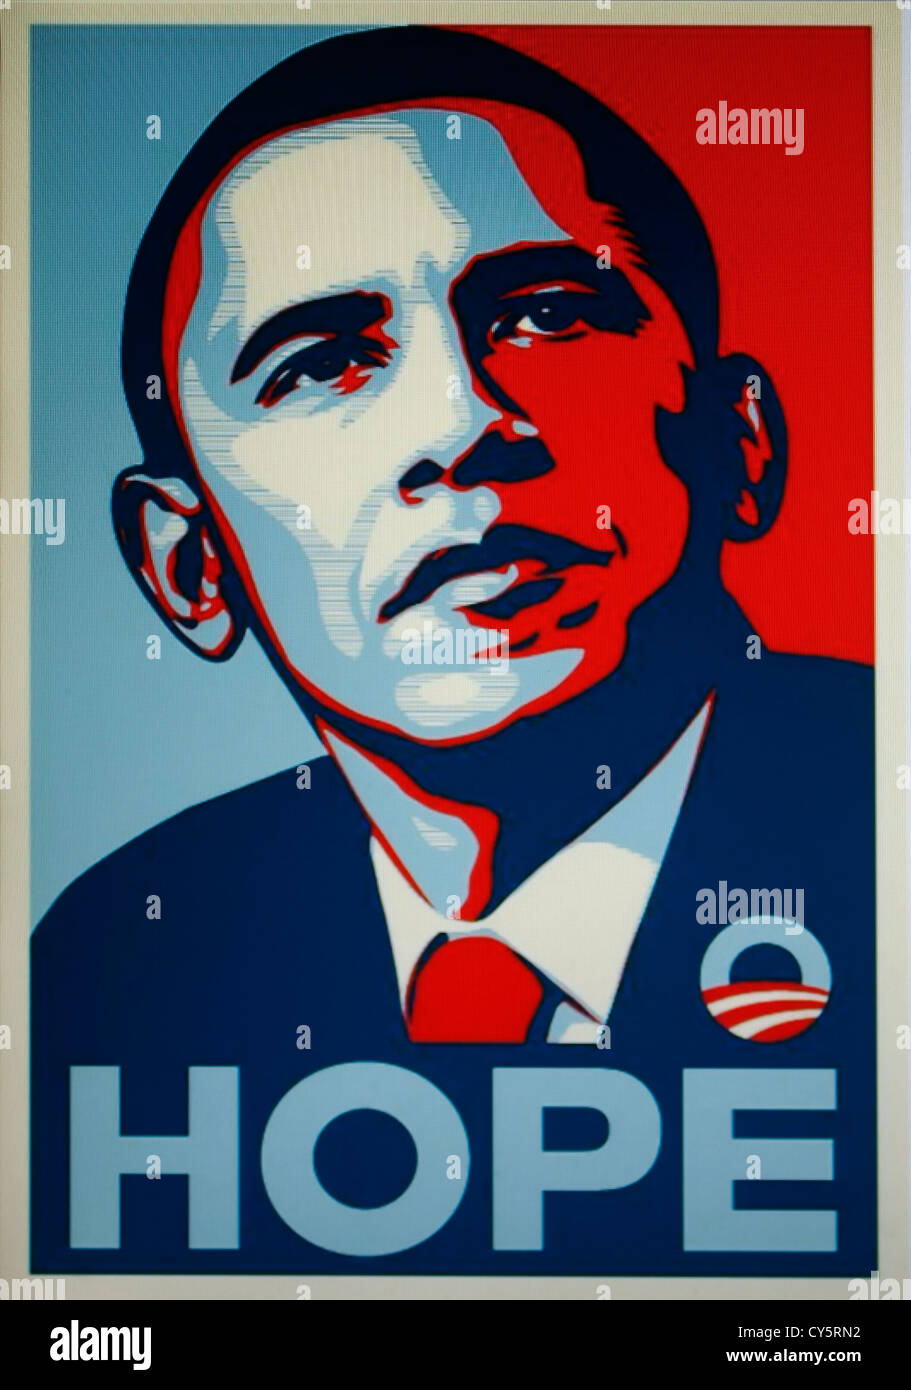 The Barack Obama 'Hope' poster (Shepard Fairey silkscreen print) - Stock Image